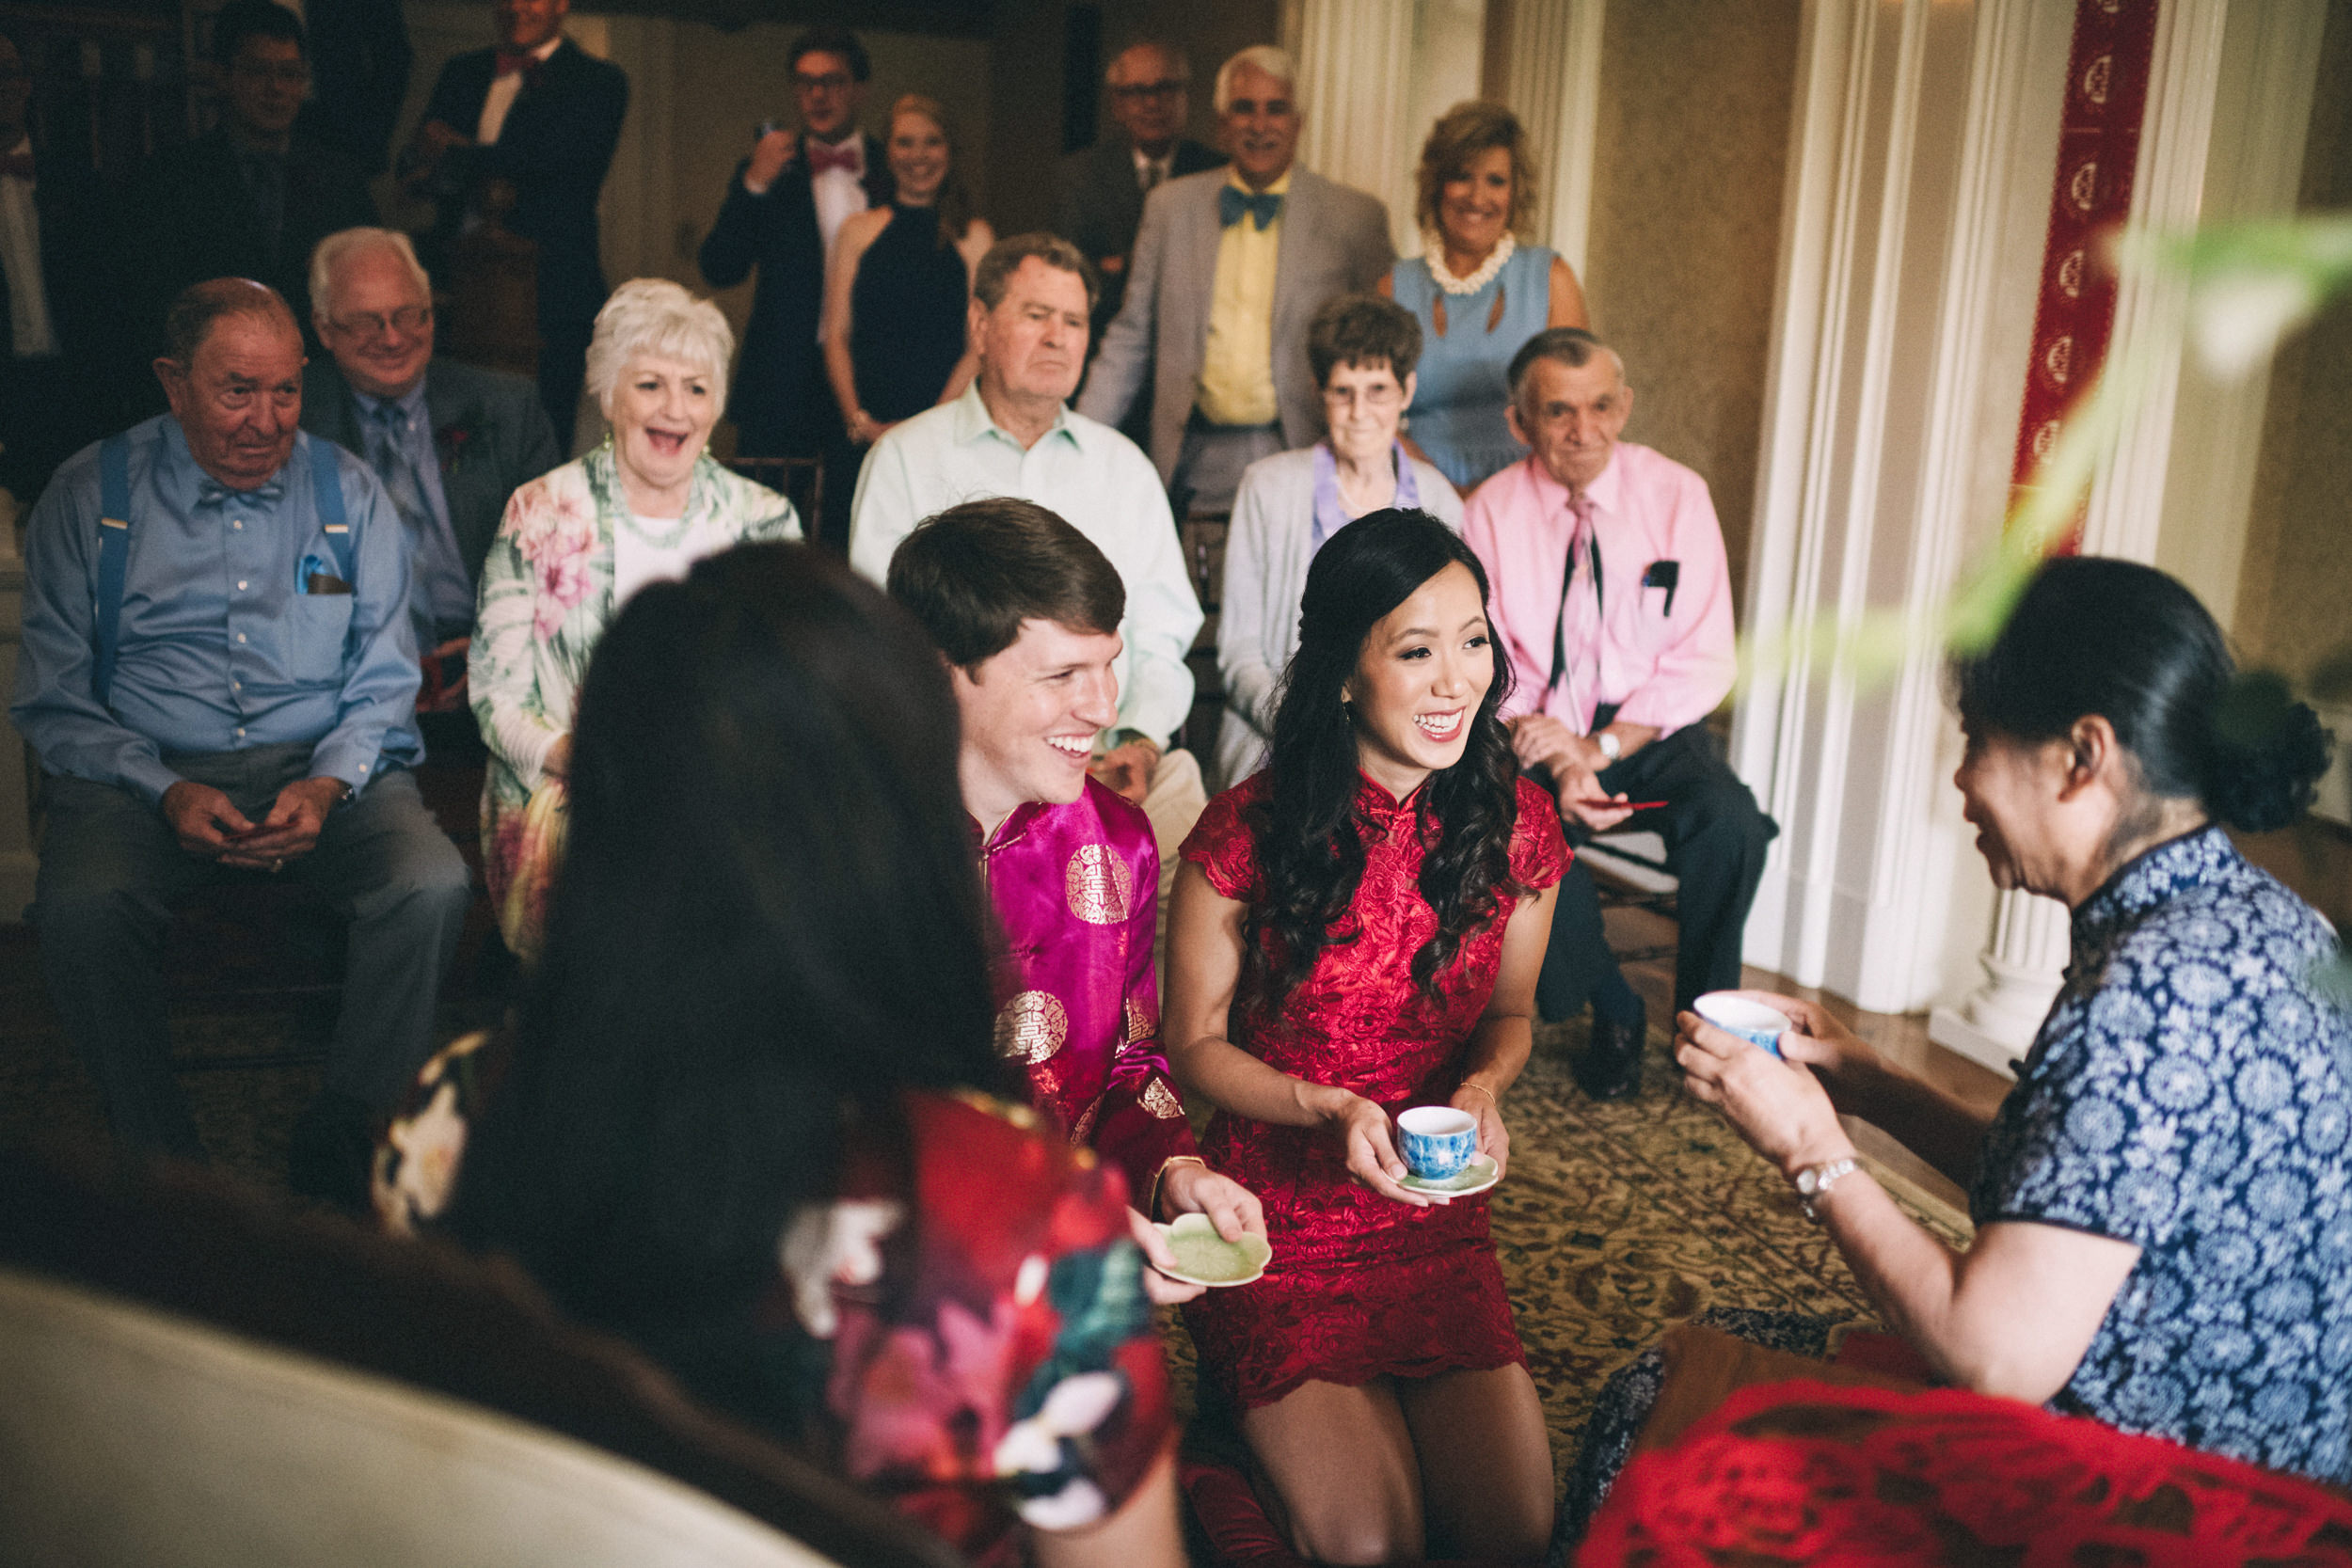 Louisville-Kentucky-Wedding-and-Elopement-Photographer-Sarah-Katherine-Davis-Photography-Summer-Jewel-Toned-Wedding-Chineese-Tea-Ceremony-Warrenwood-Manor-Danville-348.jpg